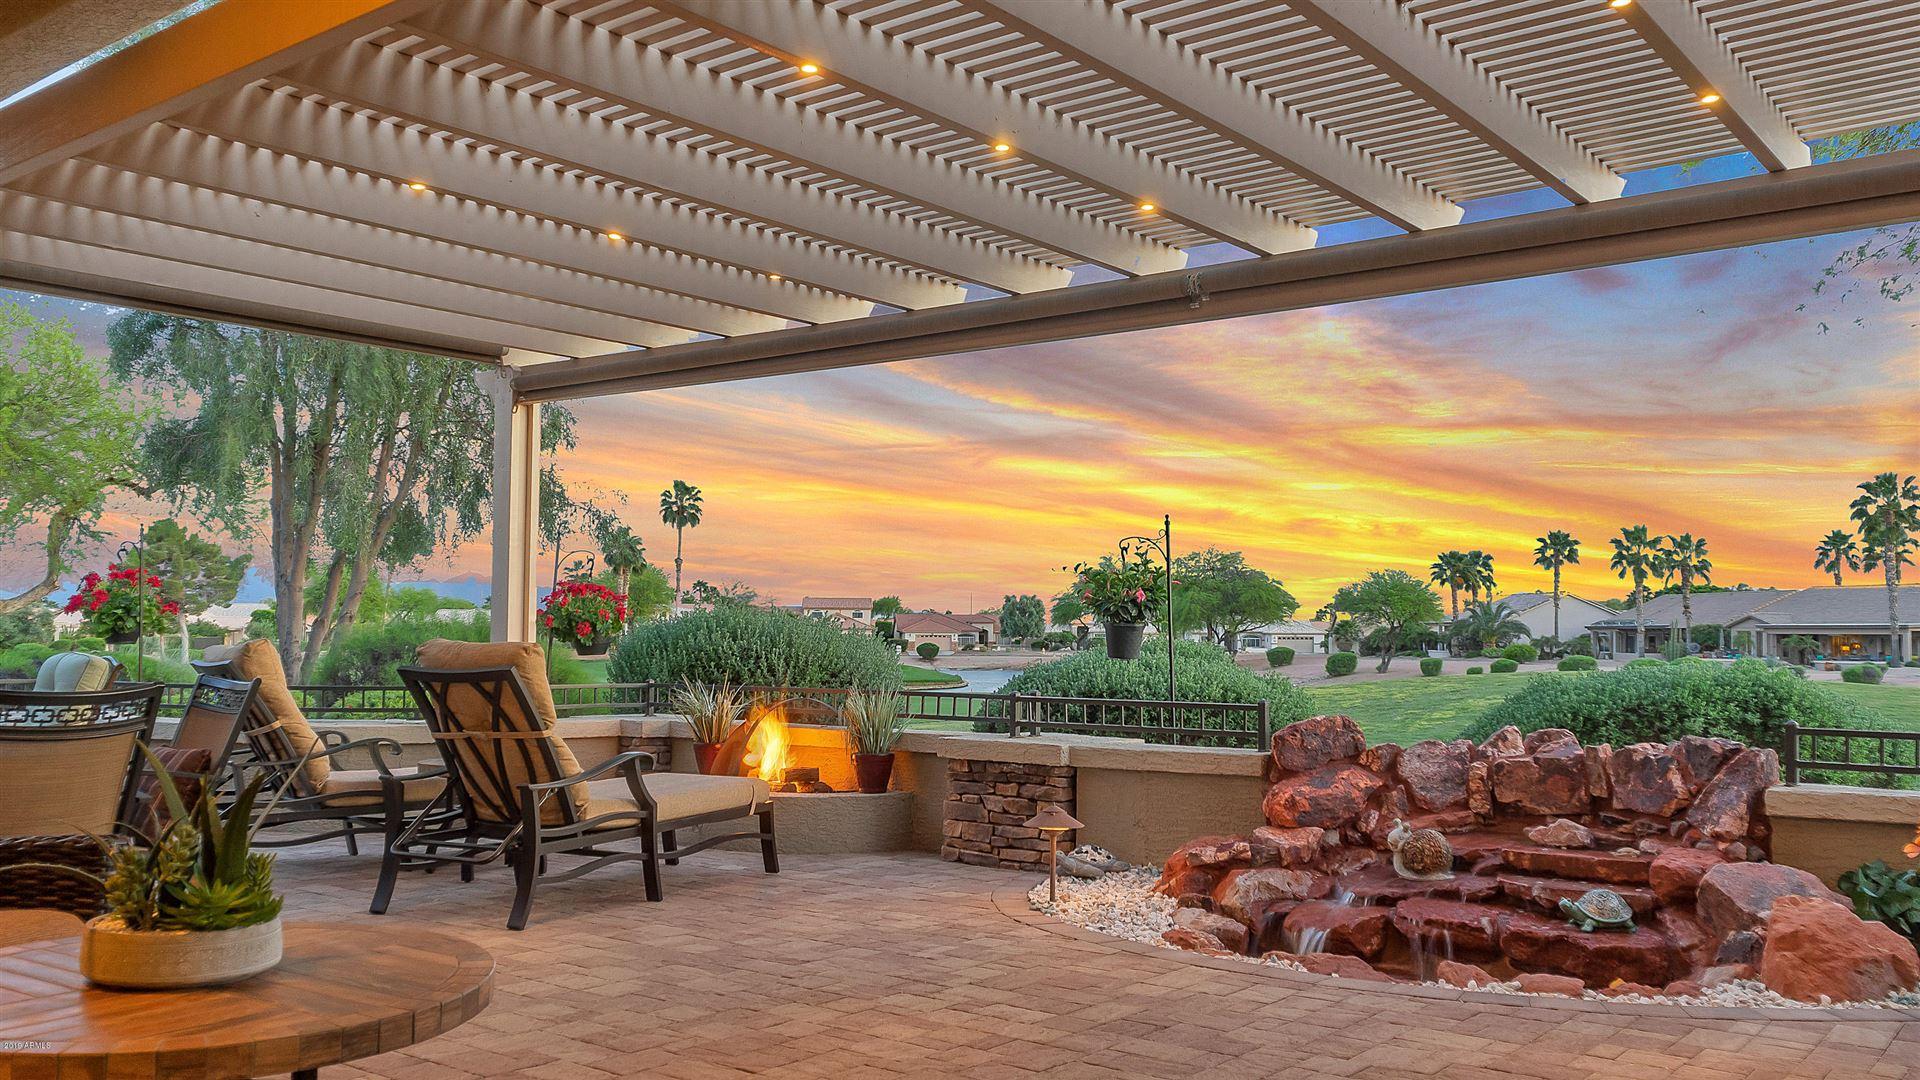 3220 N Couples Drive, Goodyear, AZ 85395 - MLS#: 6100686